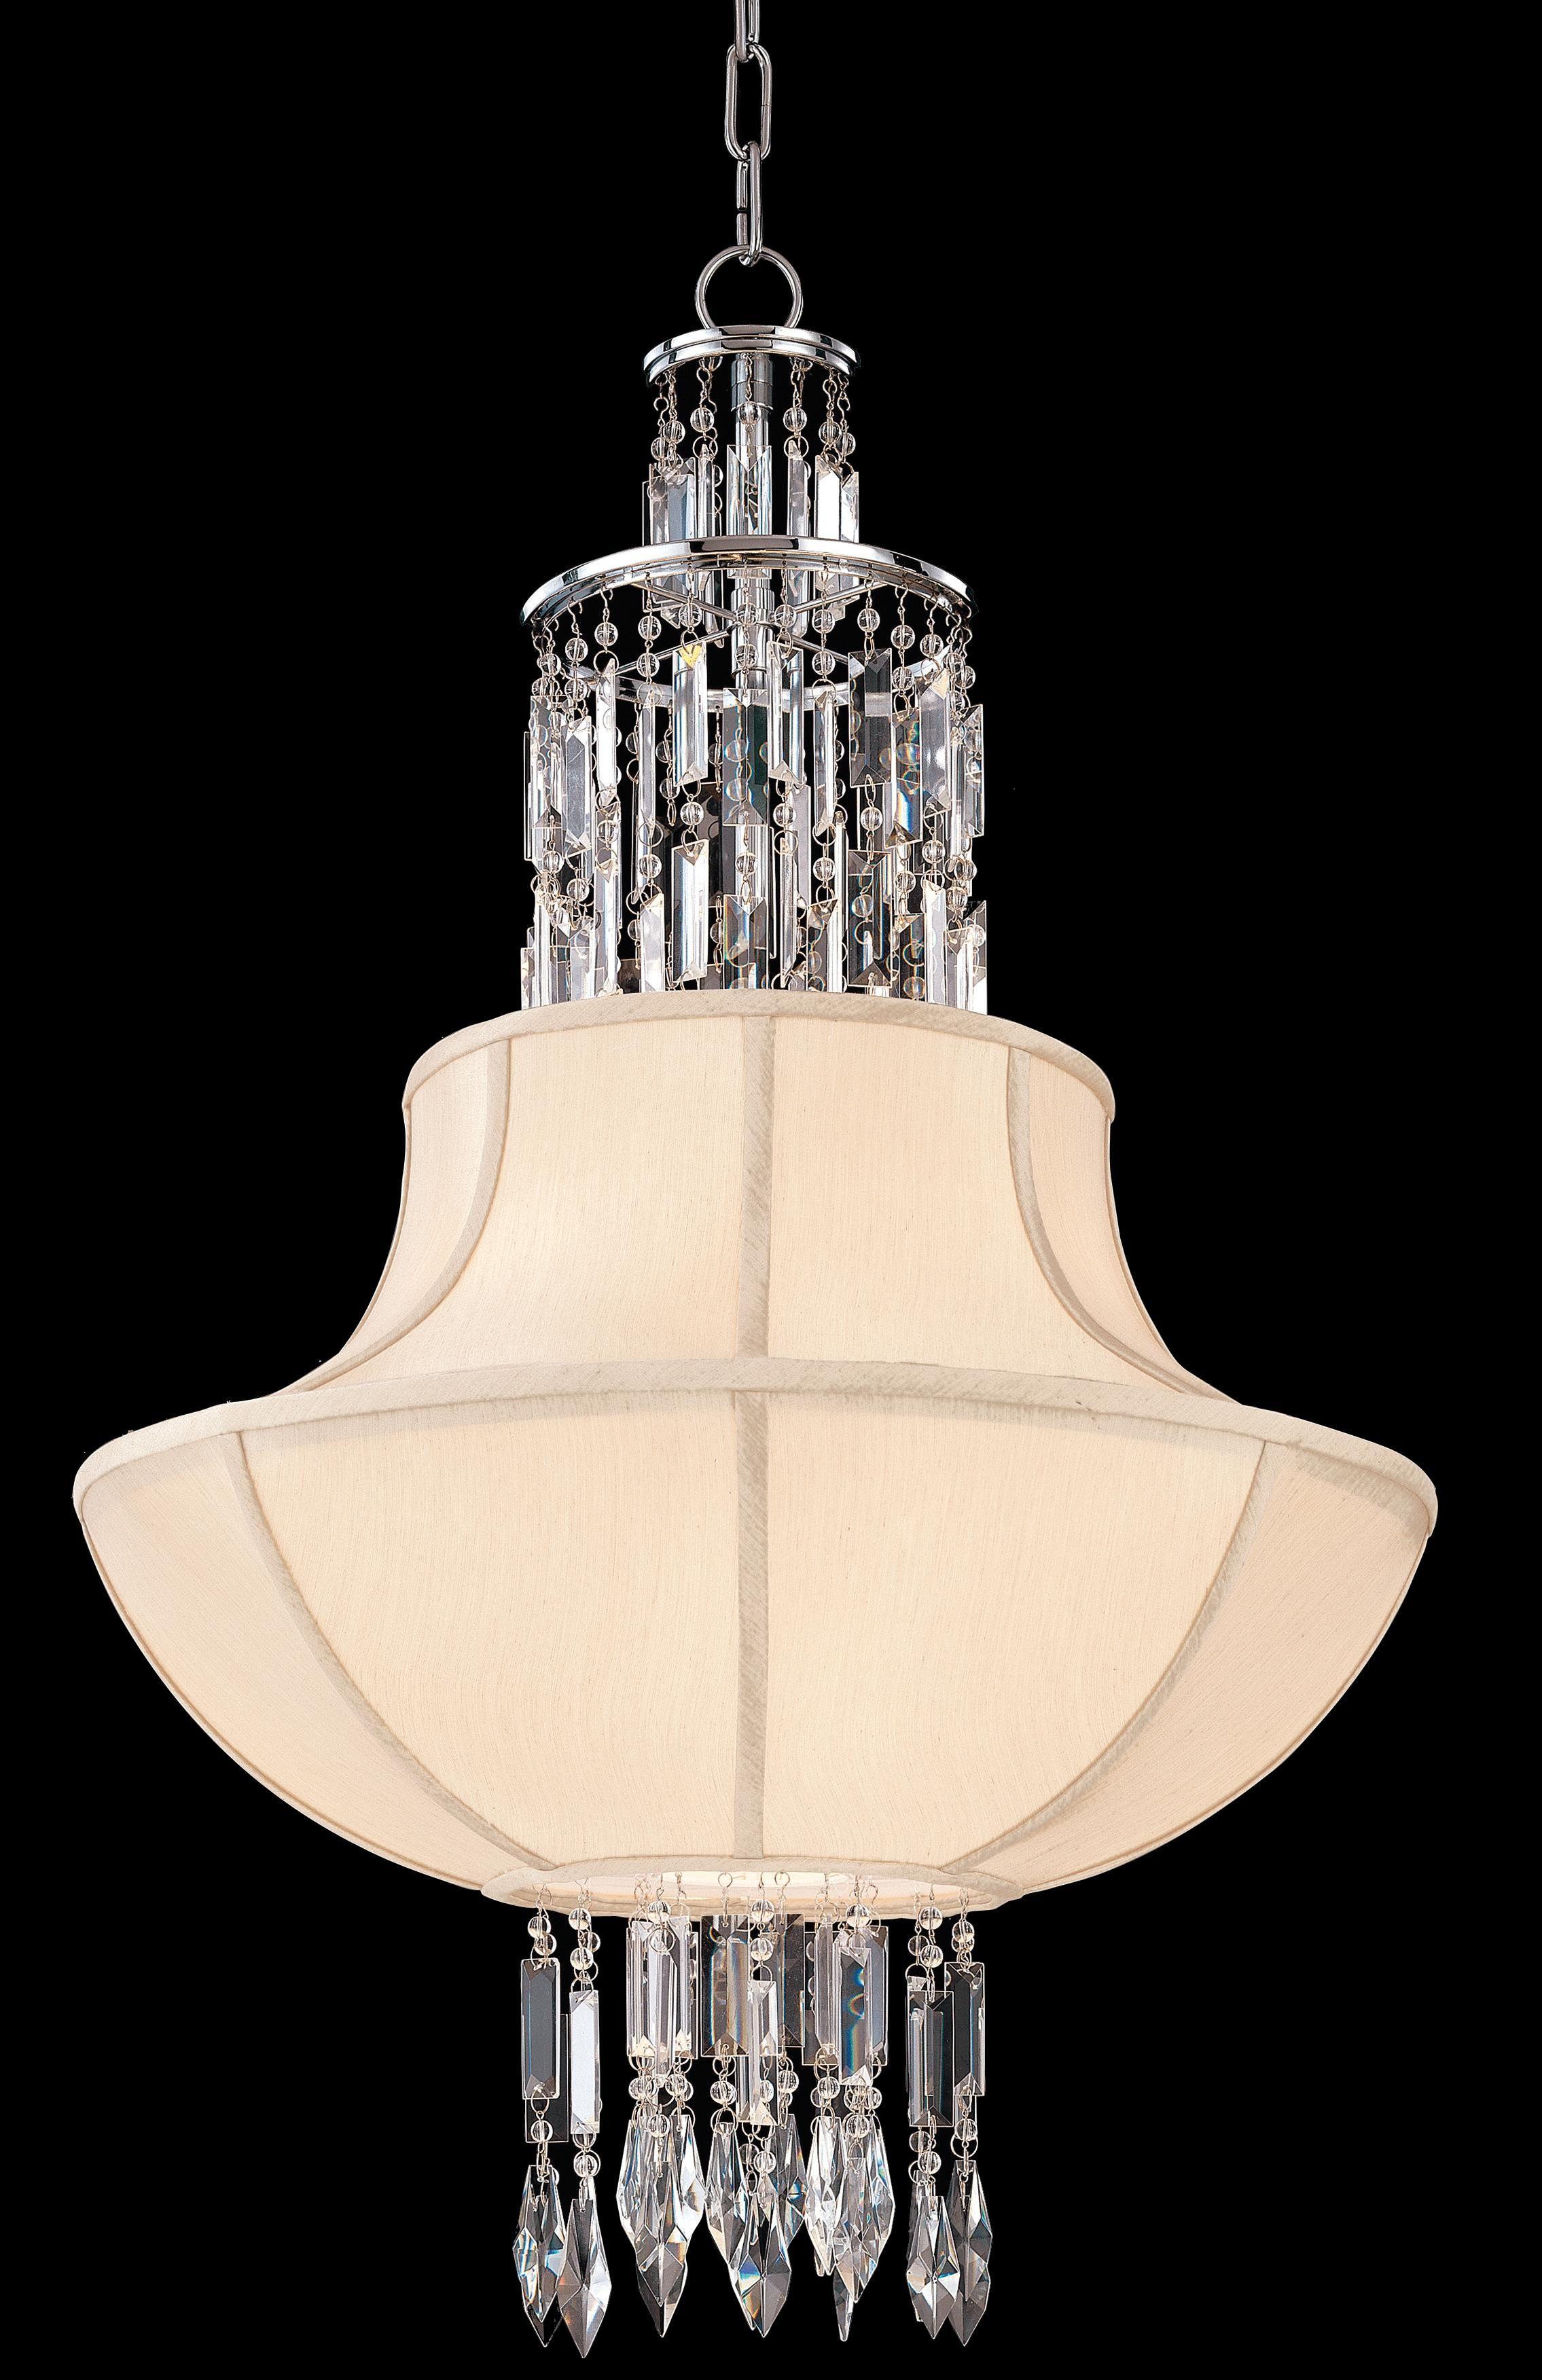 Cascade collection 24 wide chandelier lampsplus com